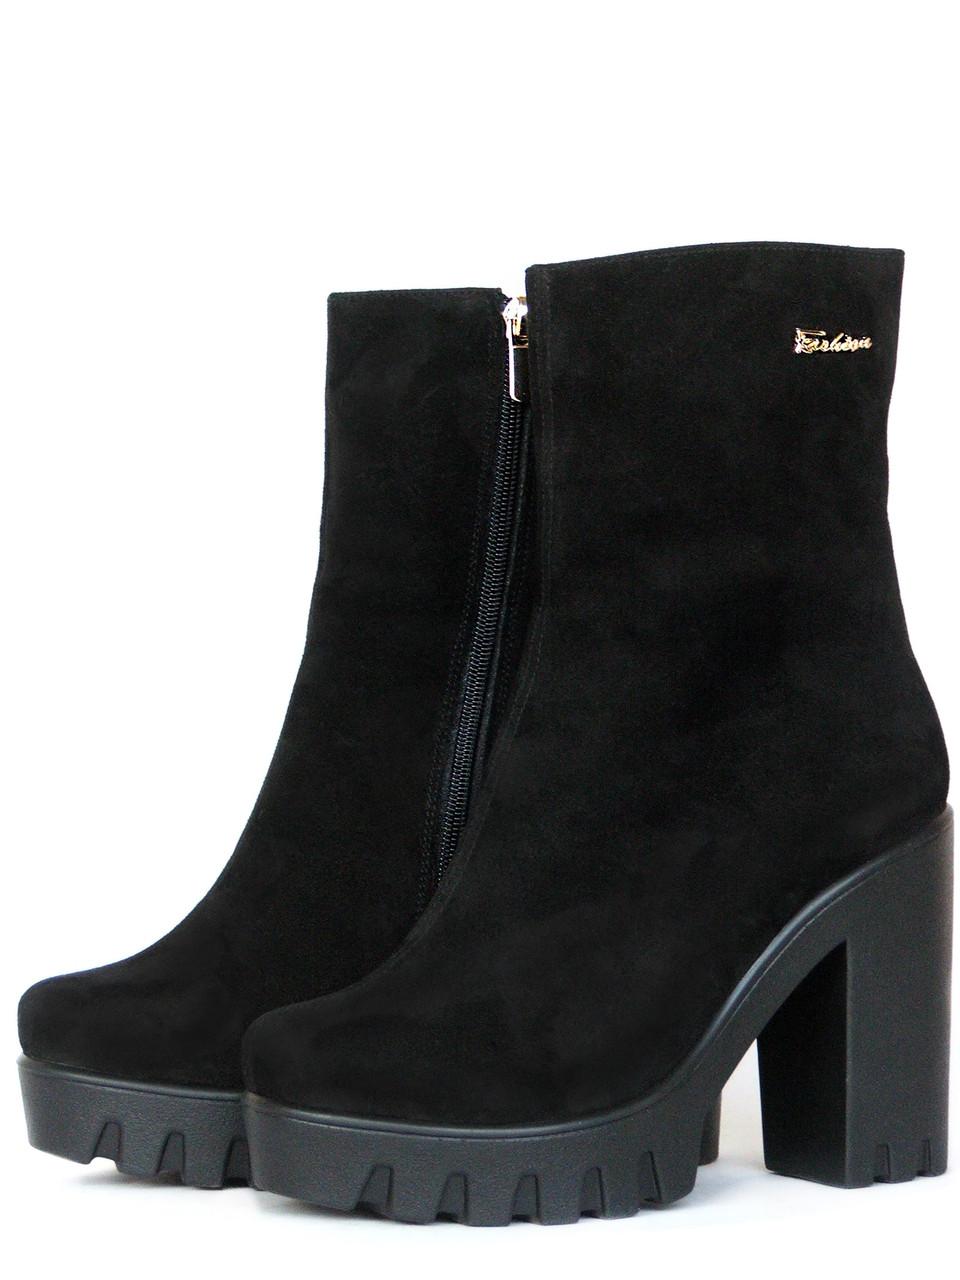 c1e076137 Замшевые ботинки на каблуке 39, цена 1 639 грн., купить в Запорожье —  Prom.ua (ID#443698111)